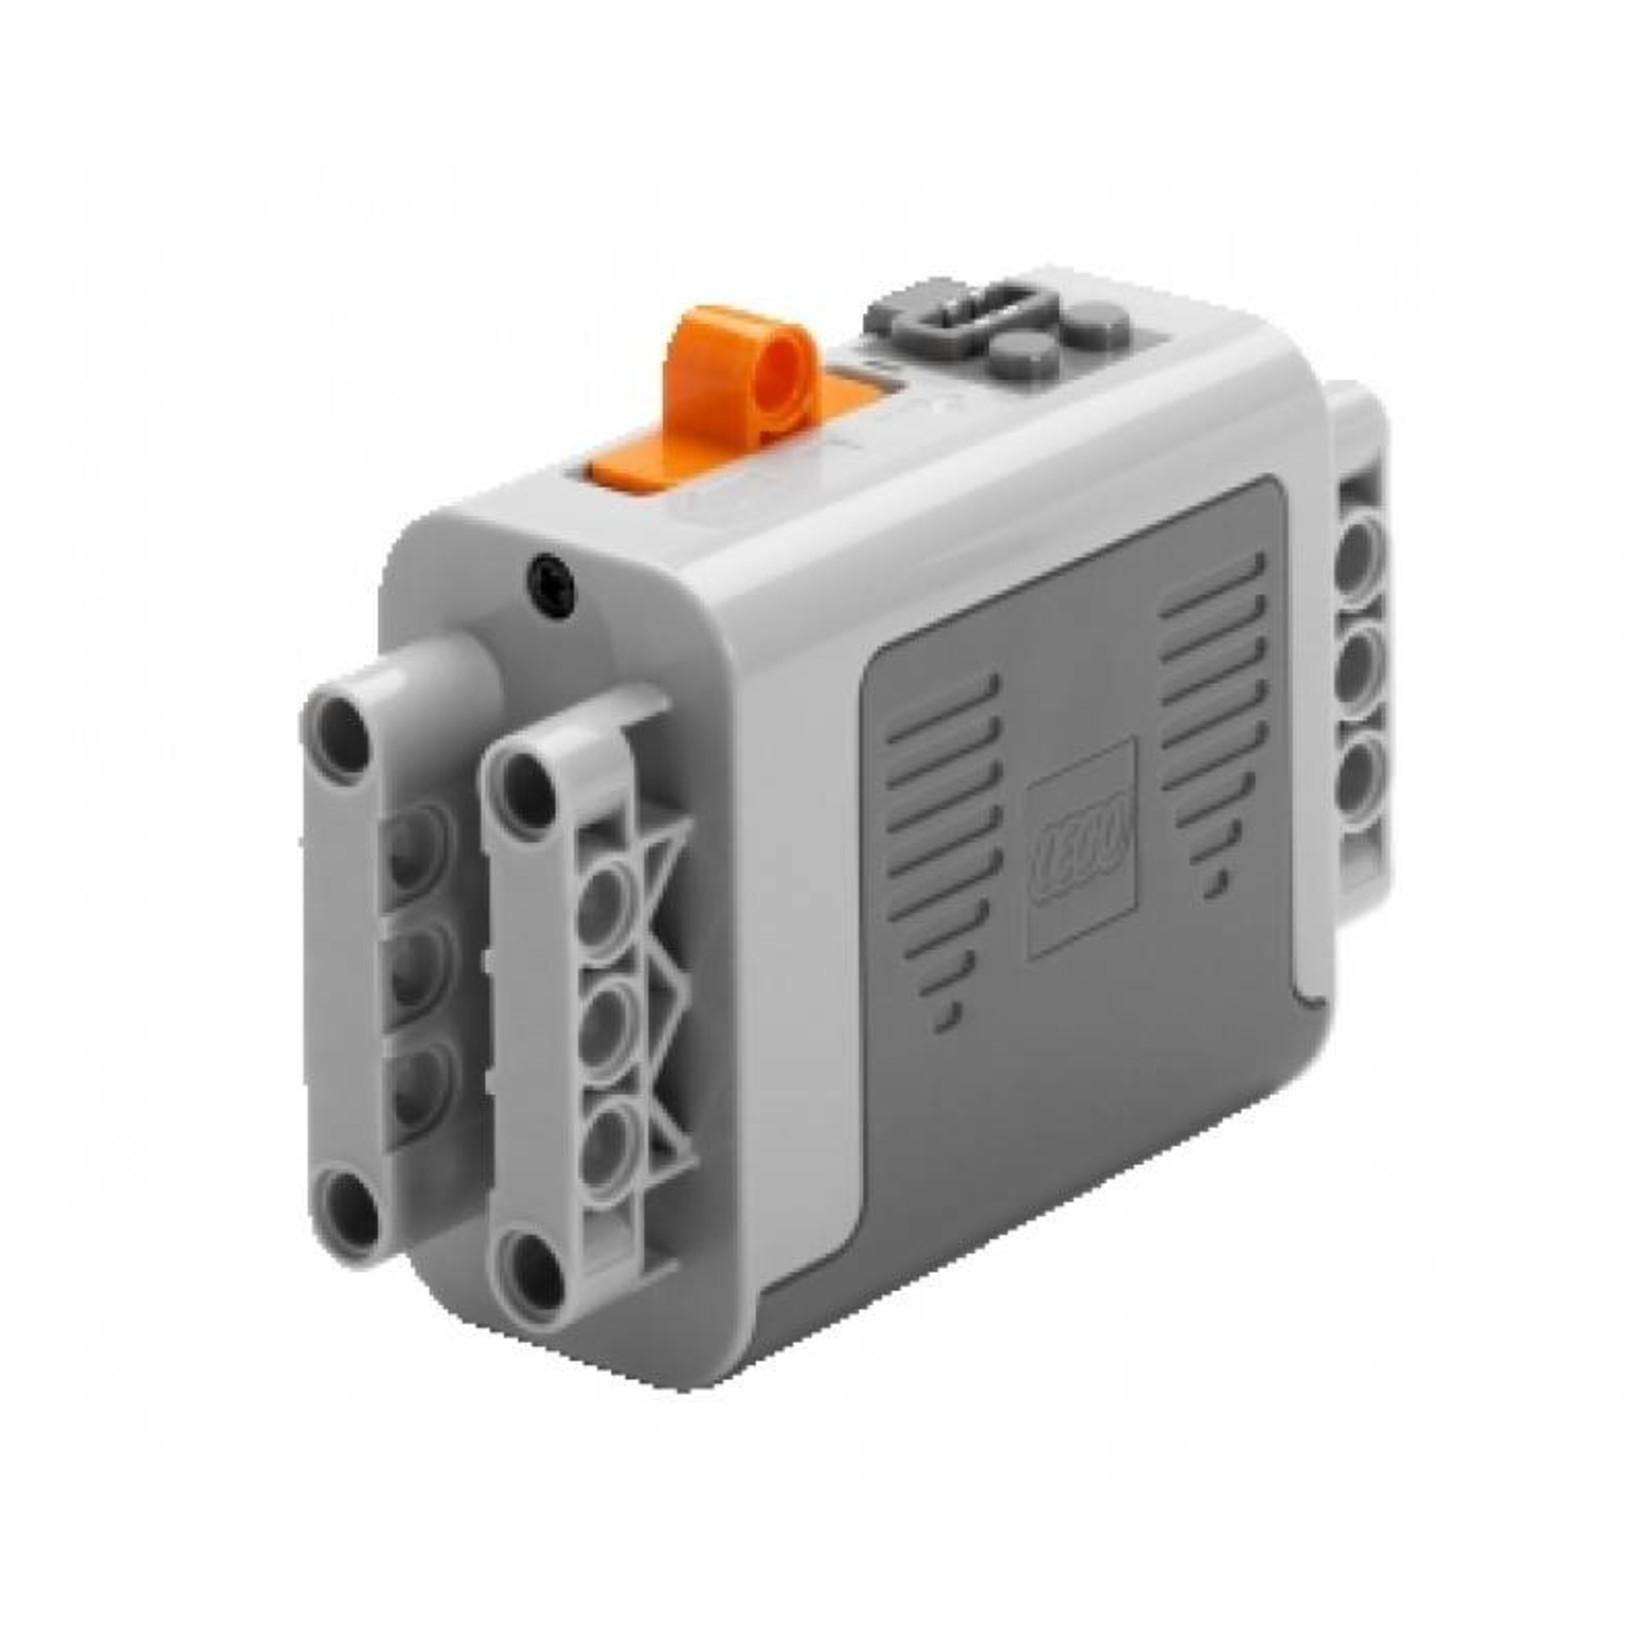 LEGO® Education Battery Box